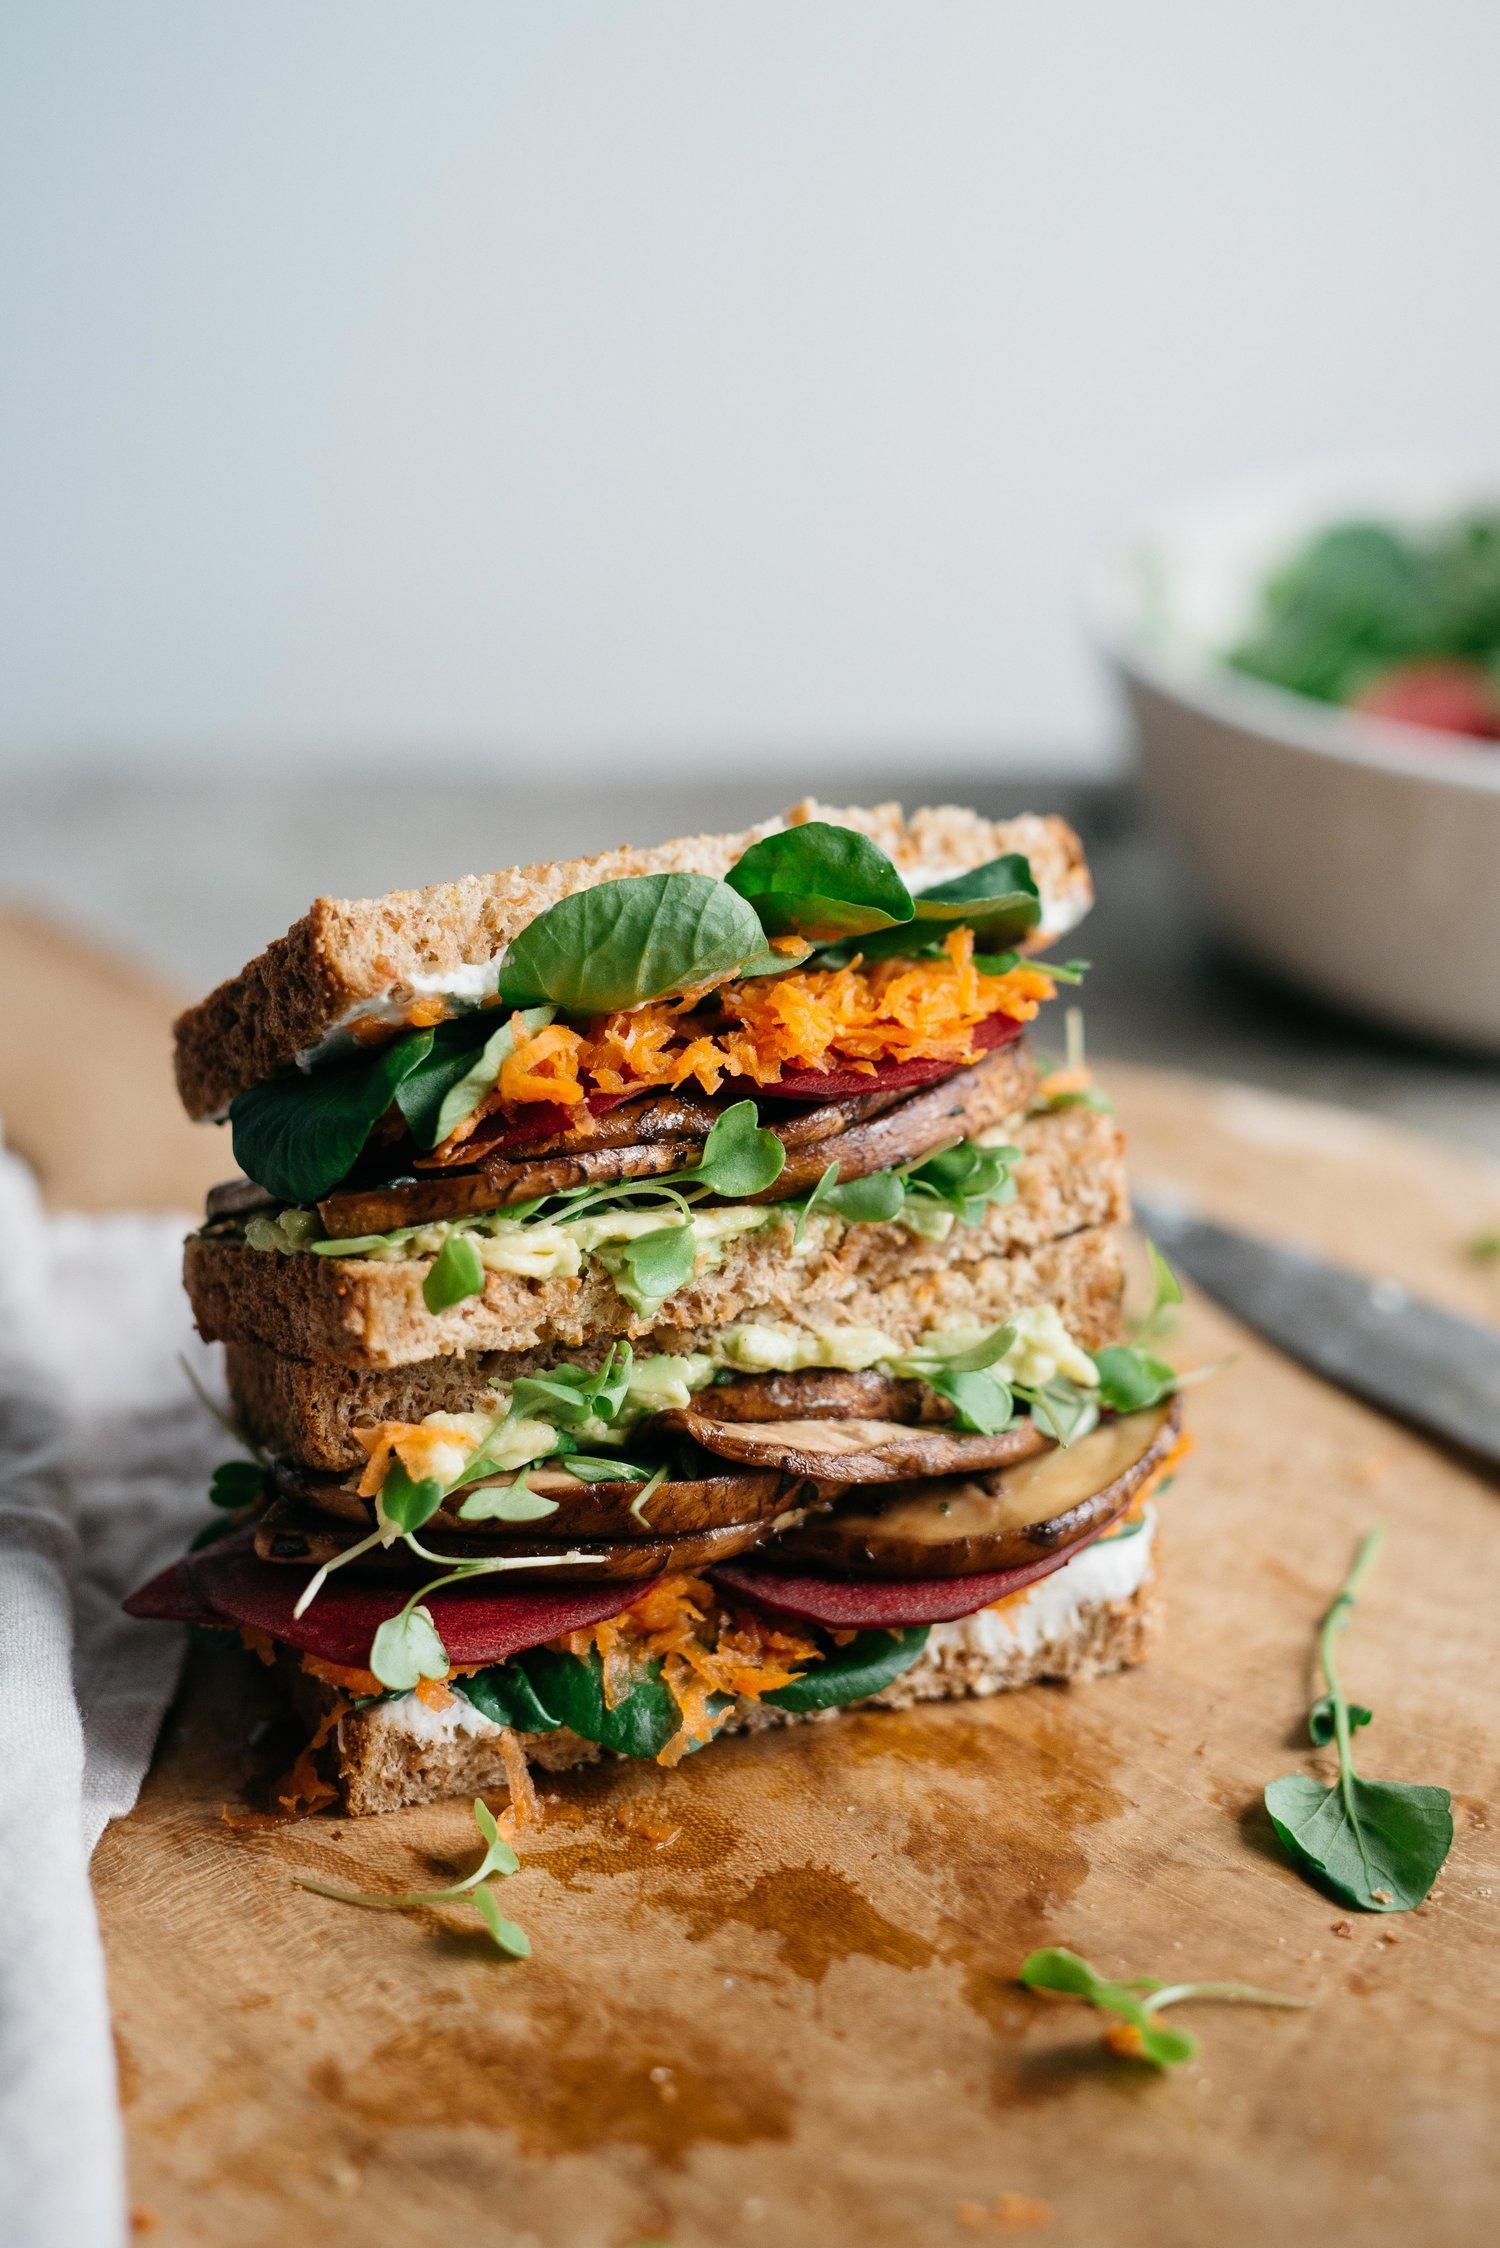 Avocado Club Sandwich with Marinated Portobello Mushrooms